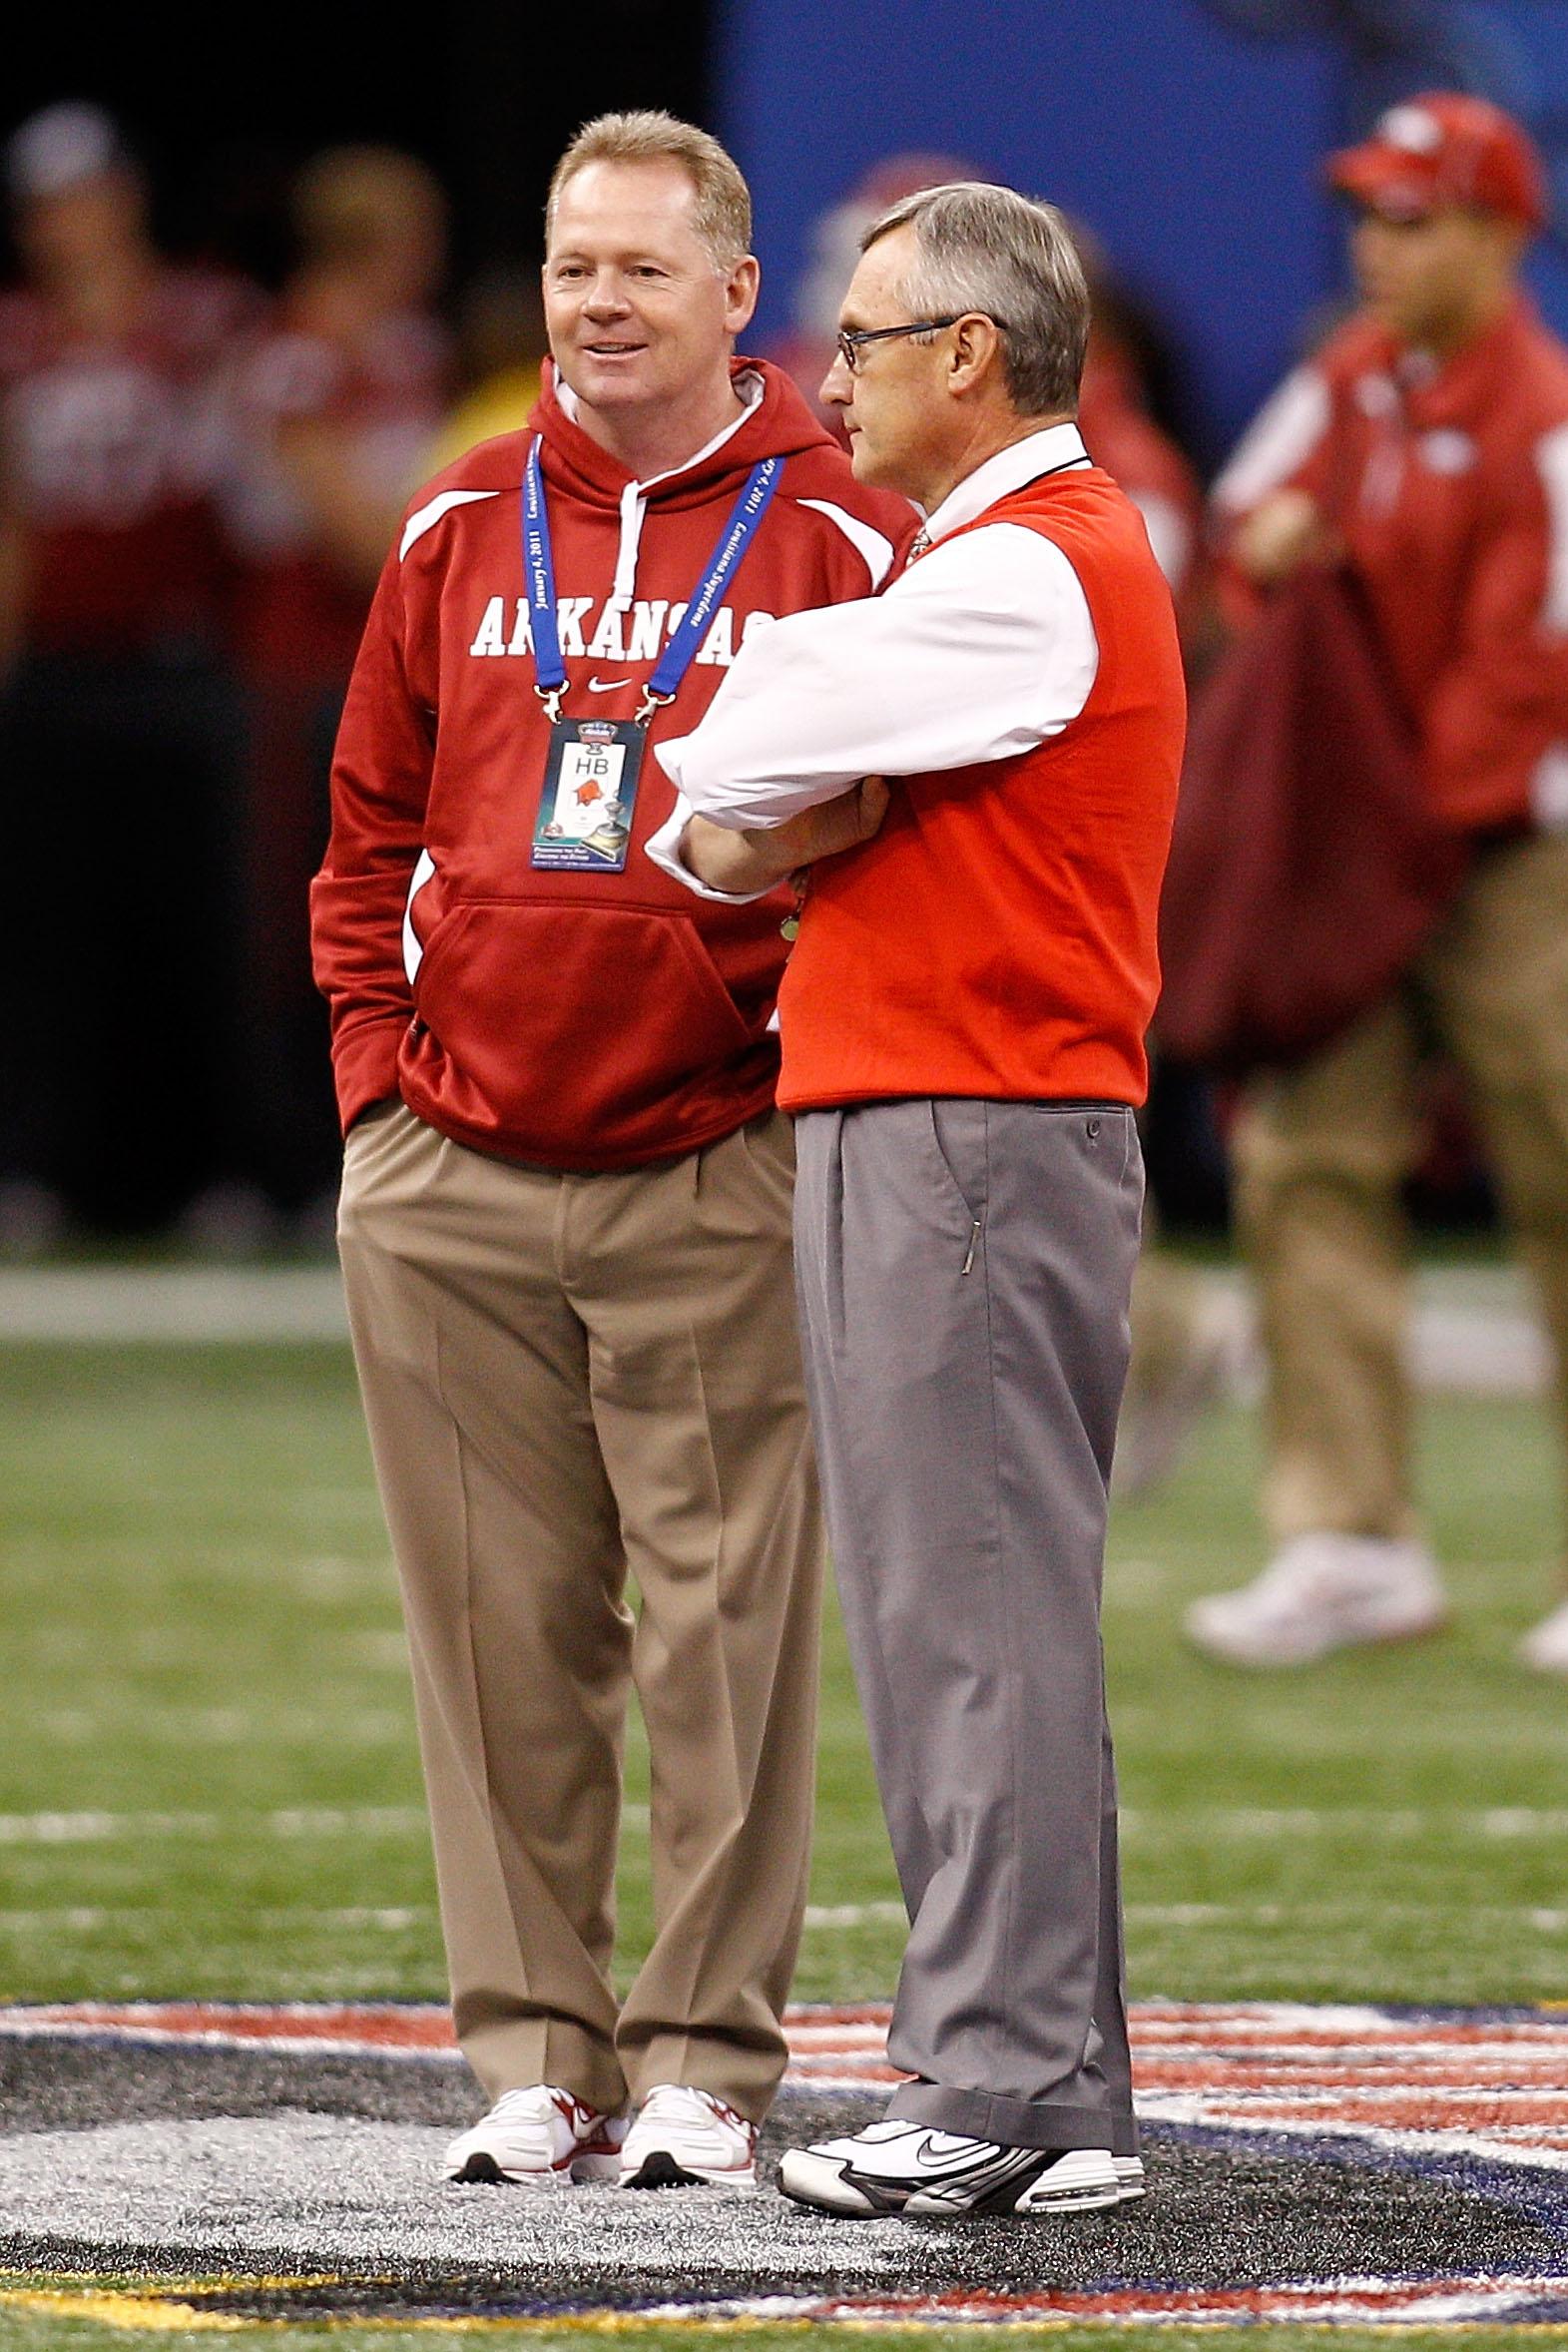 NEW ORLEANS, LA - JANUARY 04:  (L-R) Head coach Bobby Petrino of the Arkansas Razorbacks talks with head coach Jim Tressel of the Ohio State Buckeyes before the Allstate Sugar Bowl at the Louisiana Superdome on January 4, 2011 in New Orleans, Louisiana.